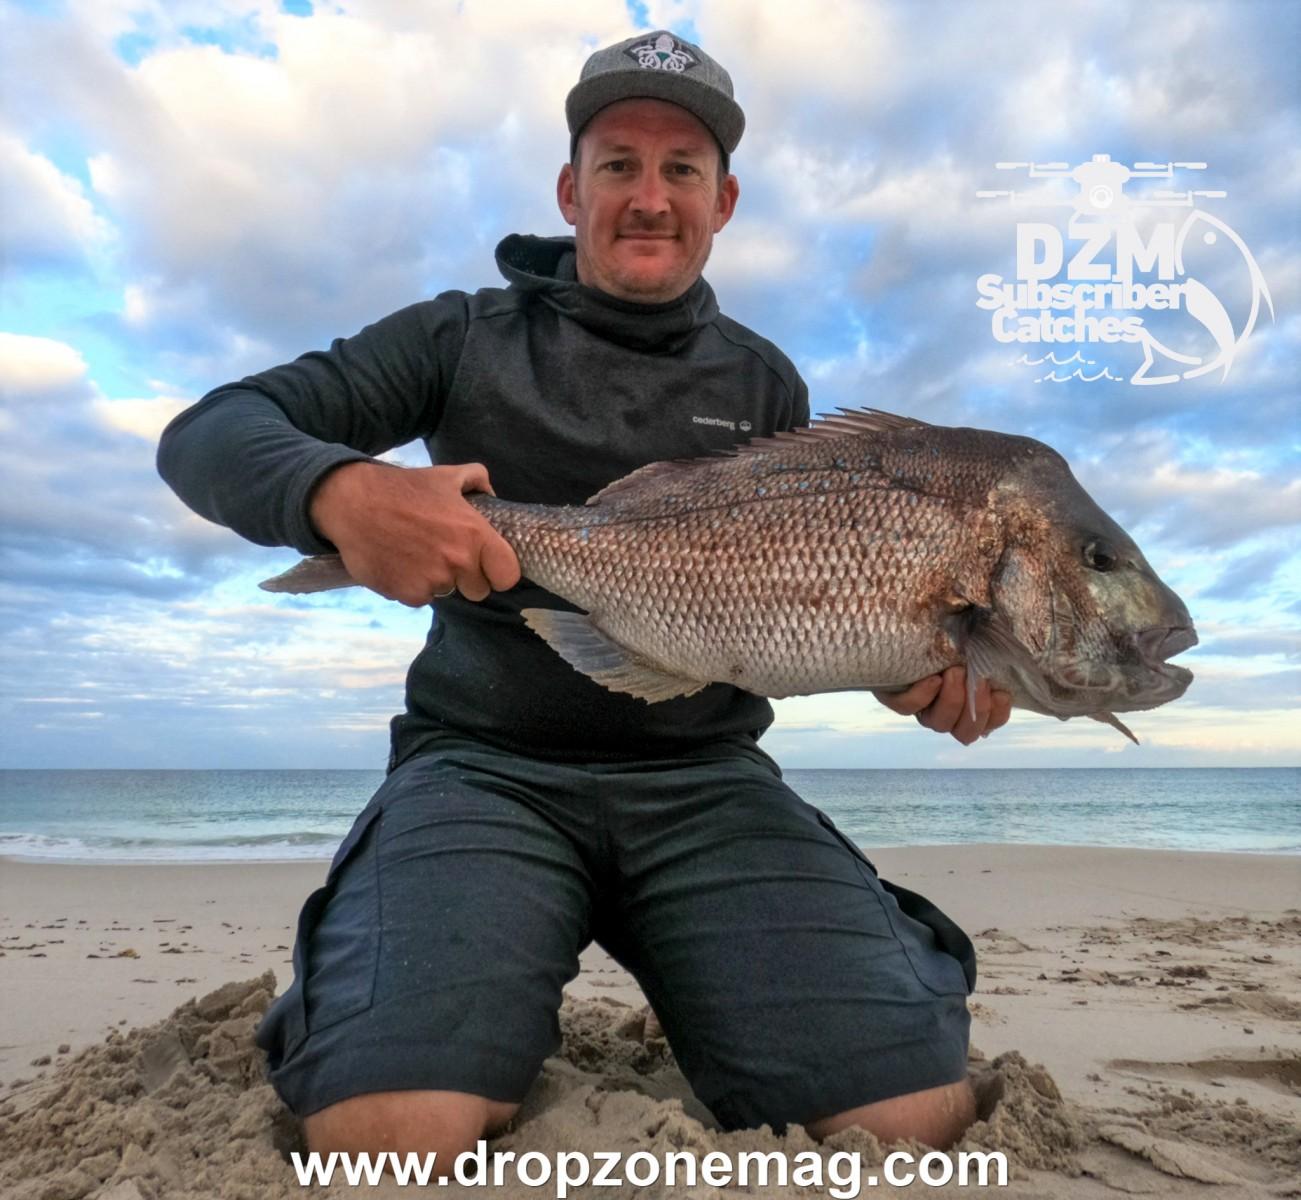 Andy Gleeson ' Danglers Drone Fishing'